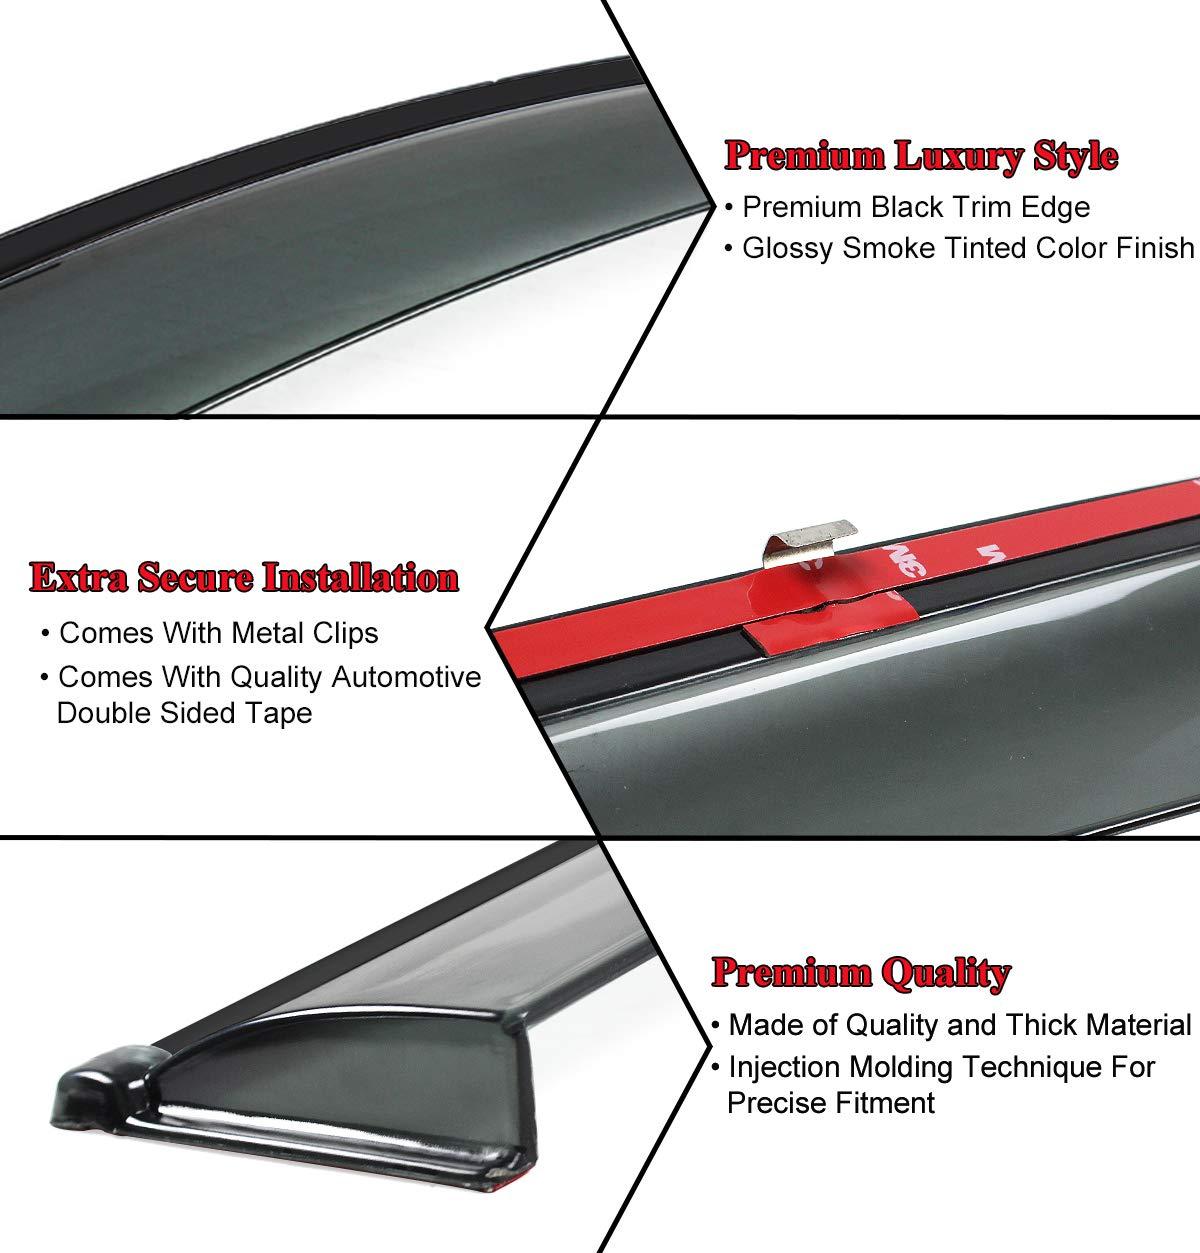 Cuztom Tuning Black Trim Clip on Smoke Tinted Window Visor Rain Guard Deflector Fits for 2016-2019 Honda Civic 4 Door Sedan